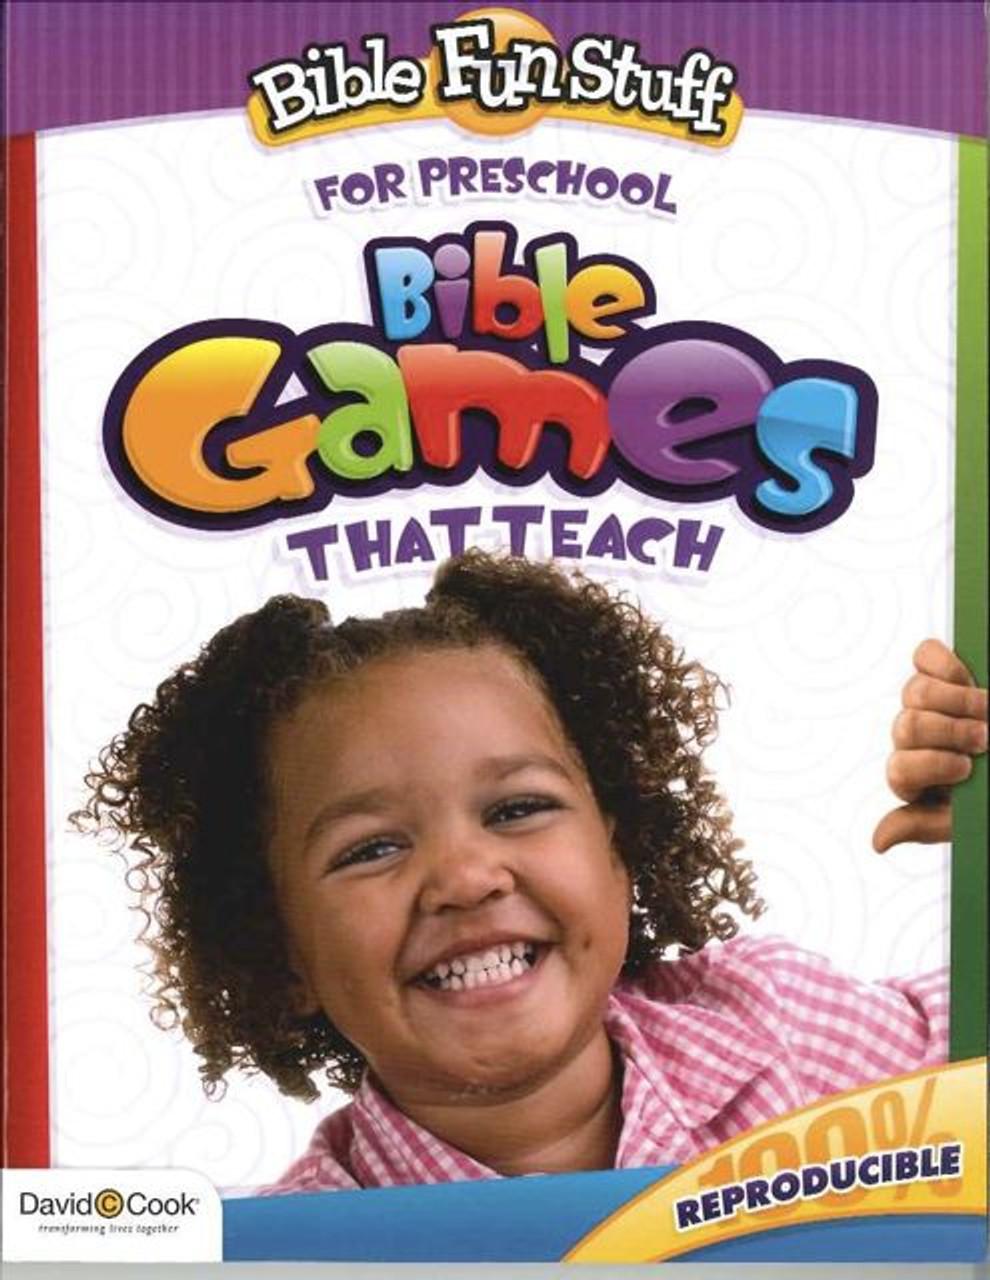 Bible Fun Stuff For Preschool Bible Games That Teach